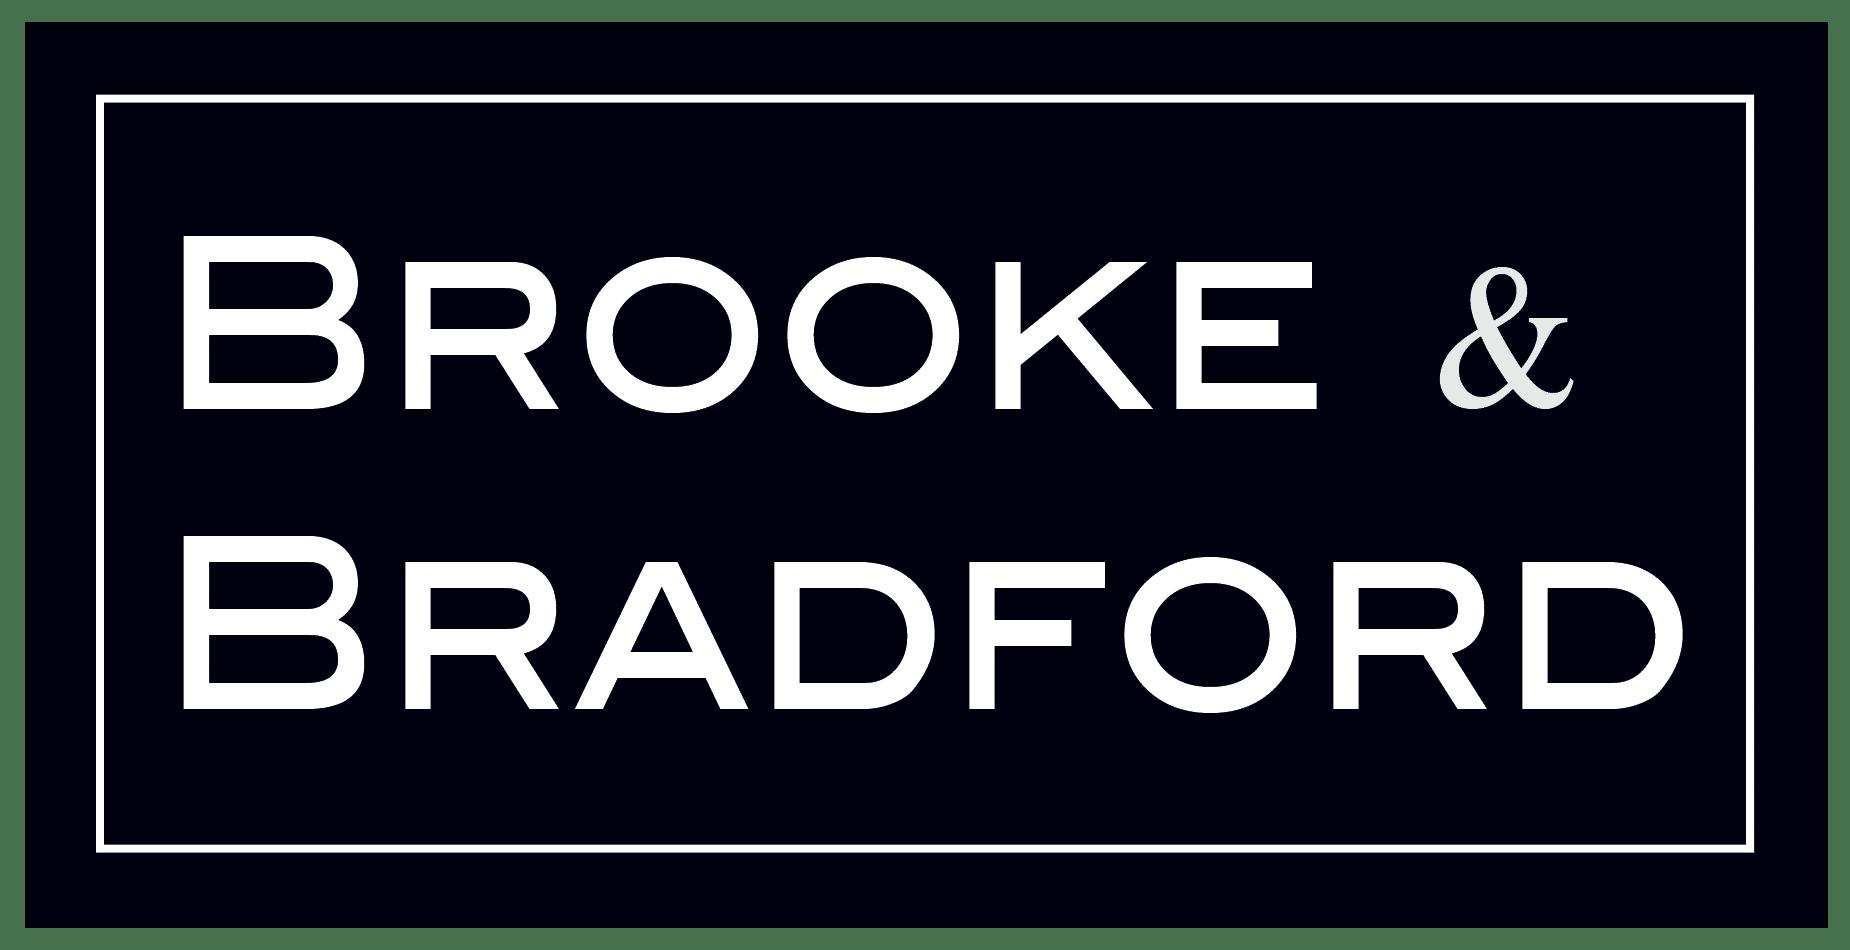 Brooke & Bradford